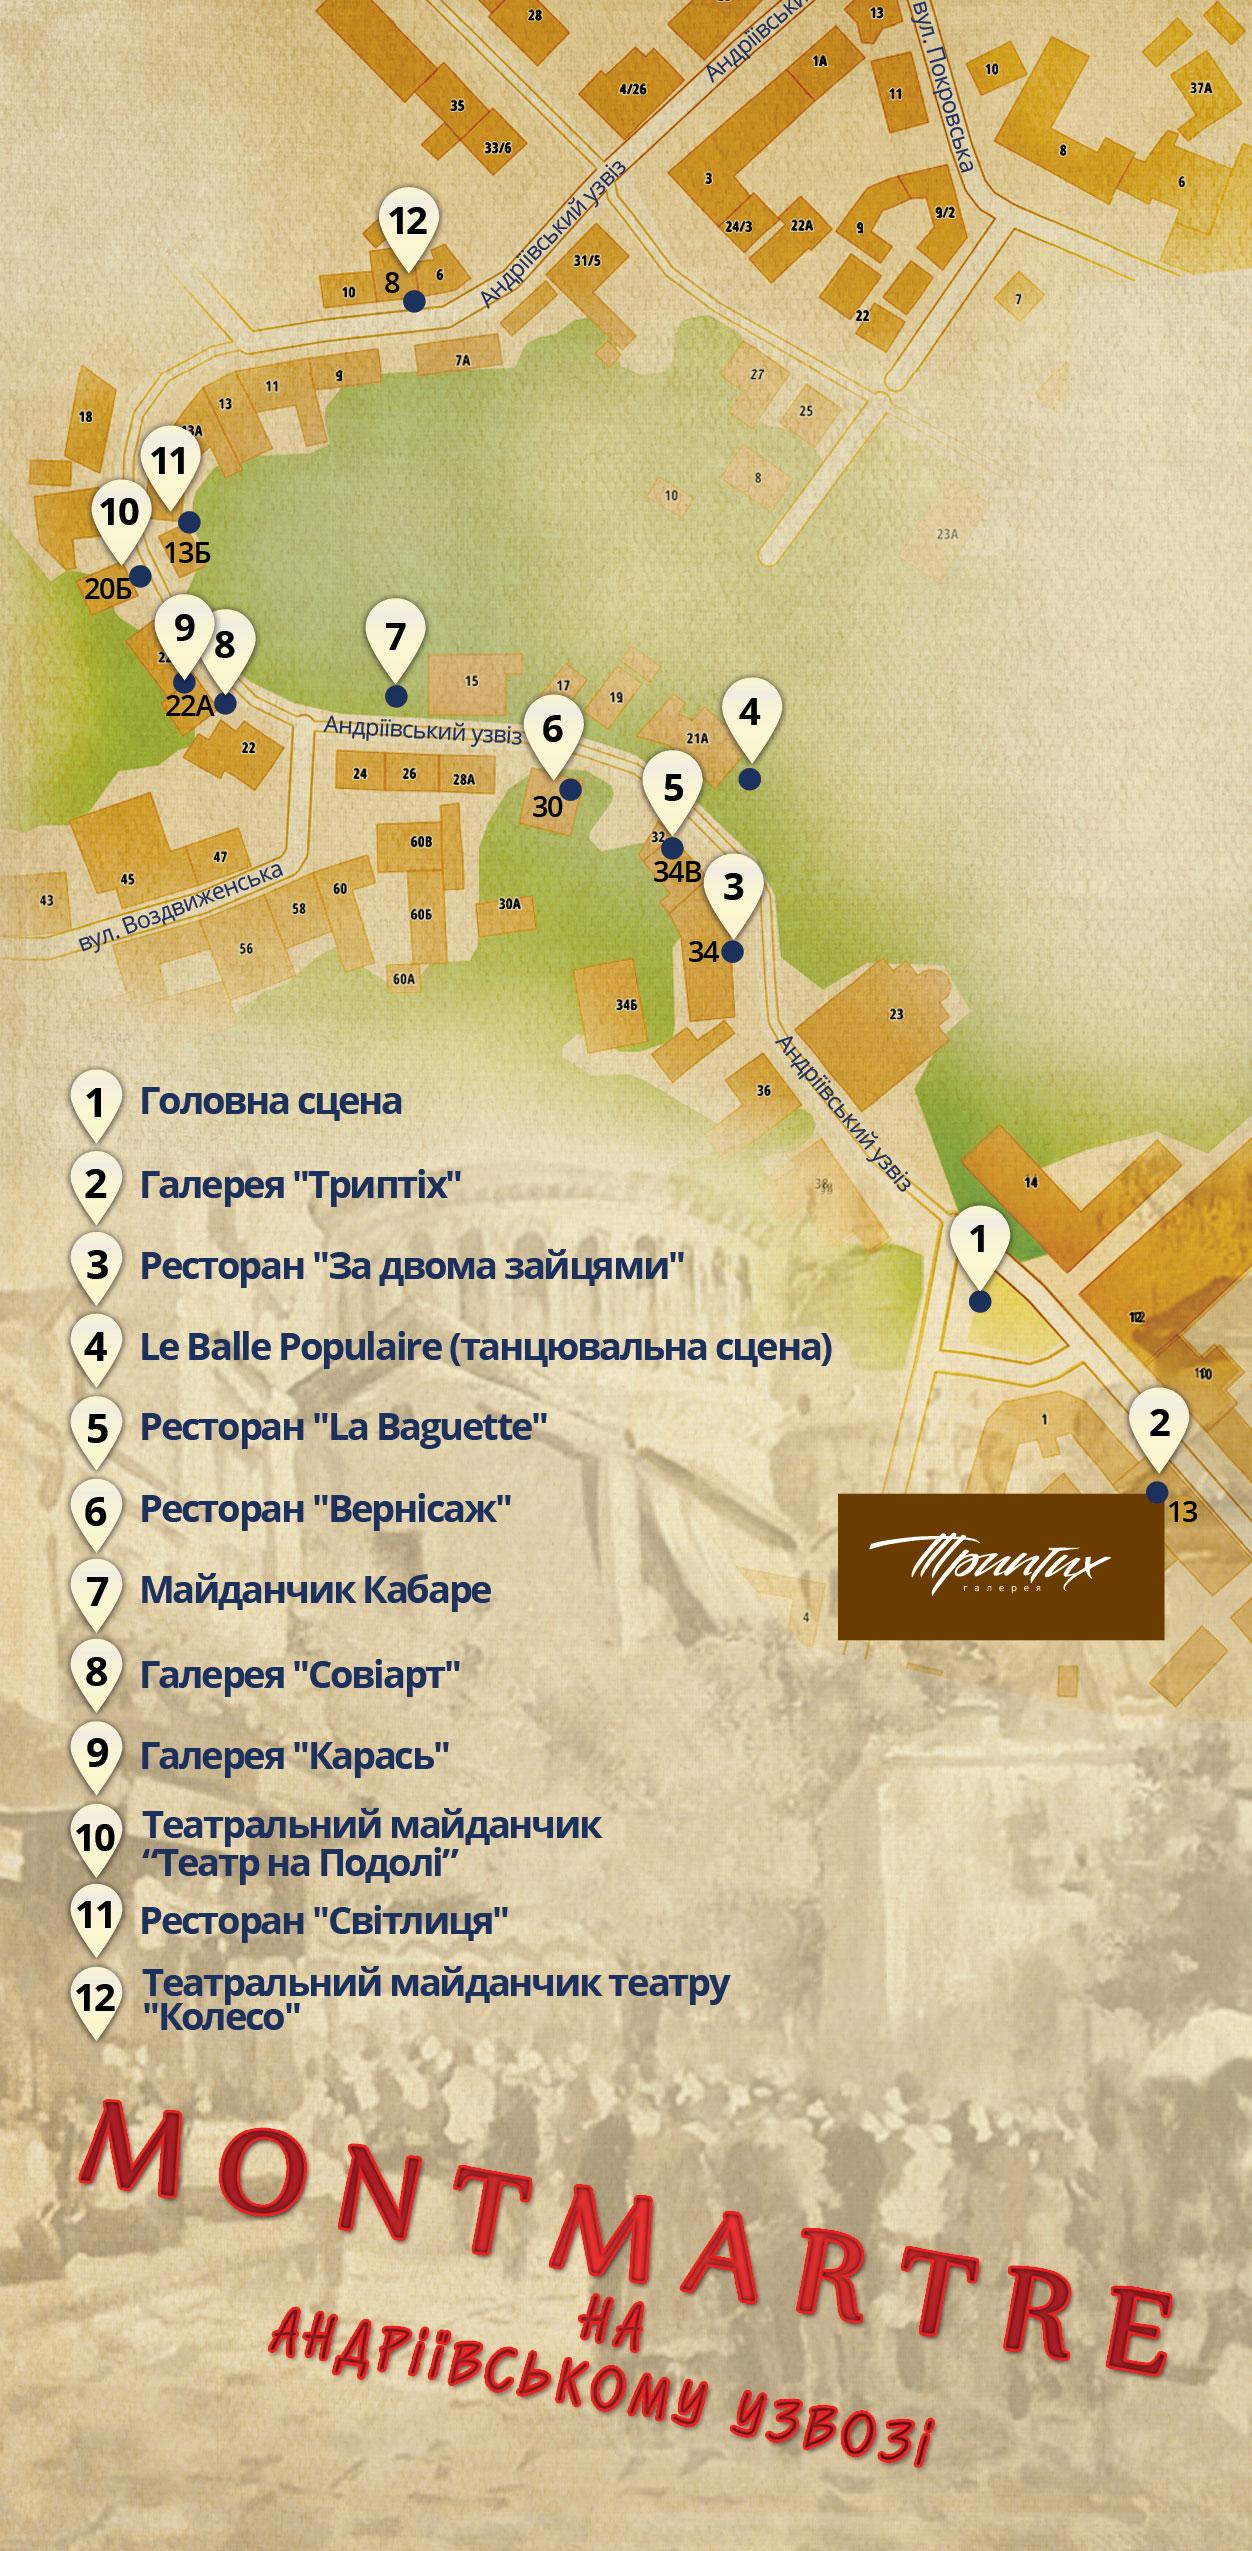 Монмартр на Андреевском Спуске 2013